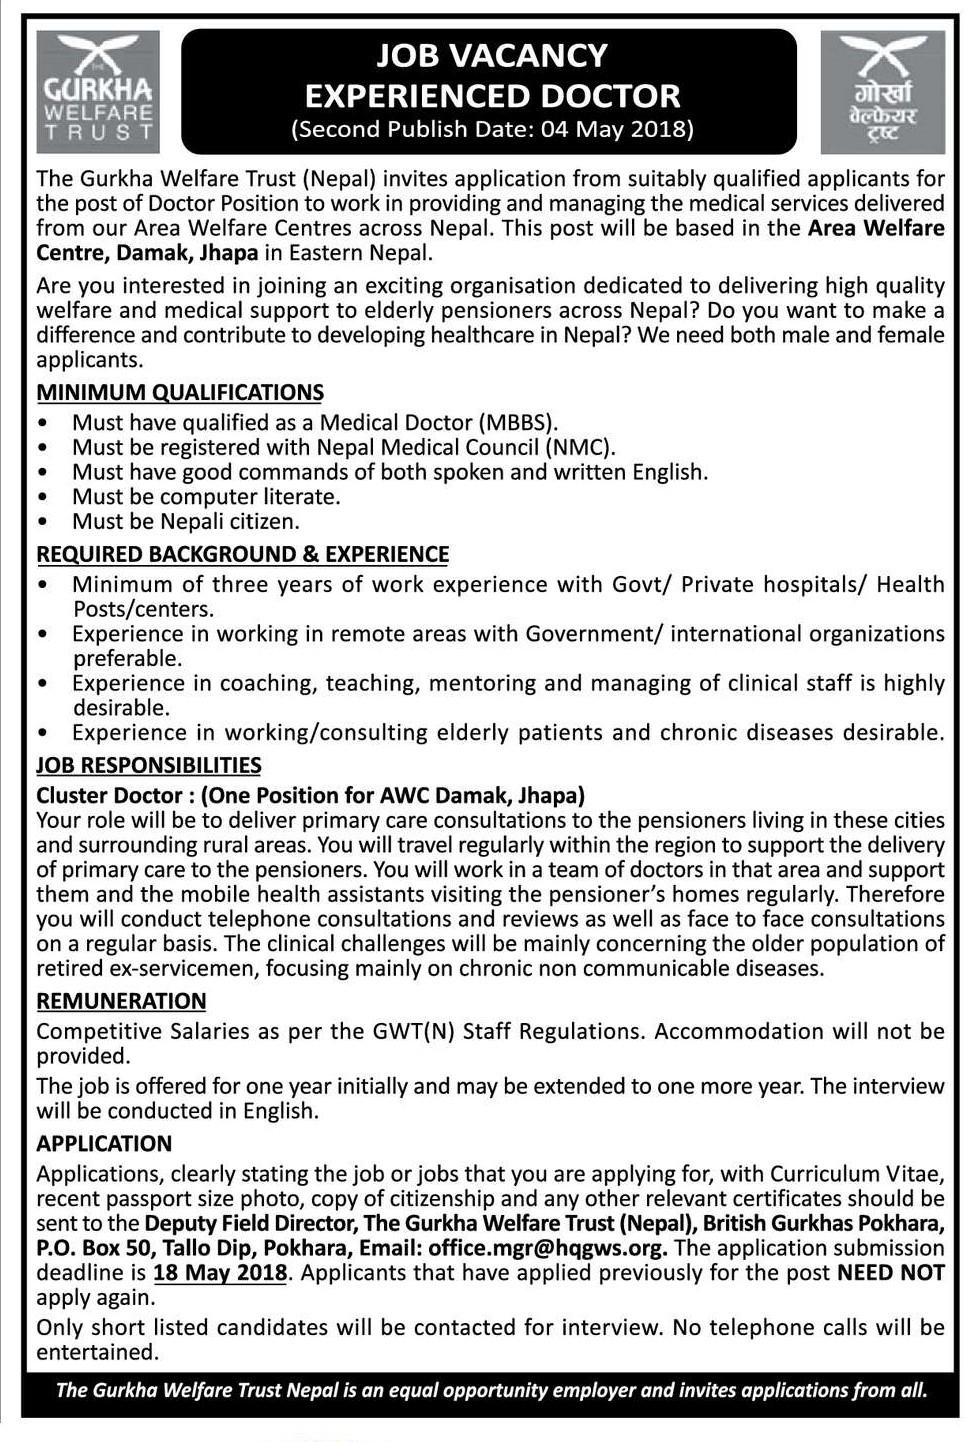 gurkha welfare trust vacancy